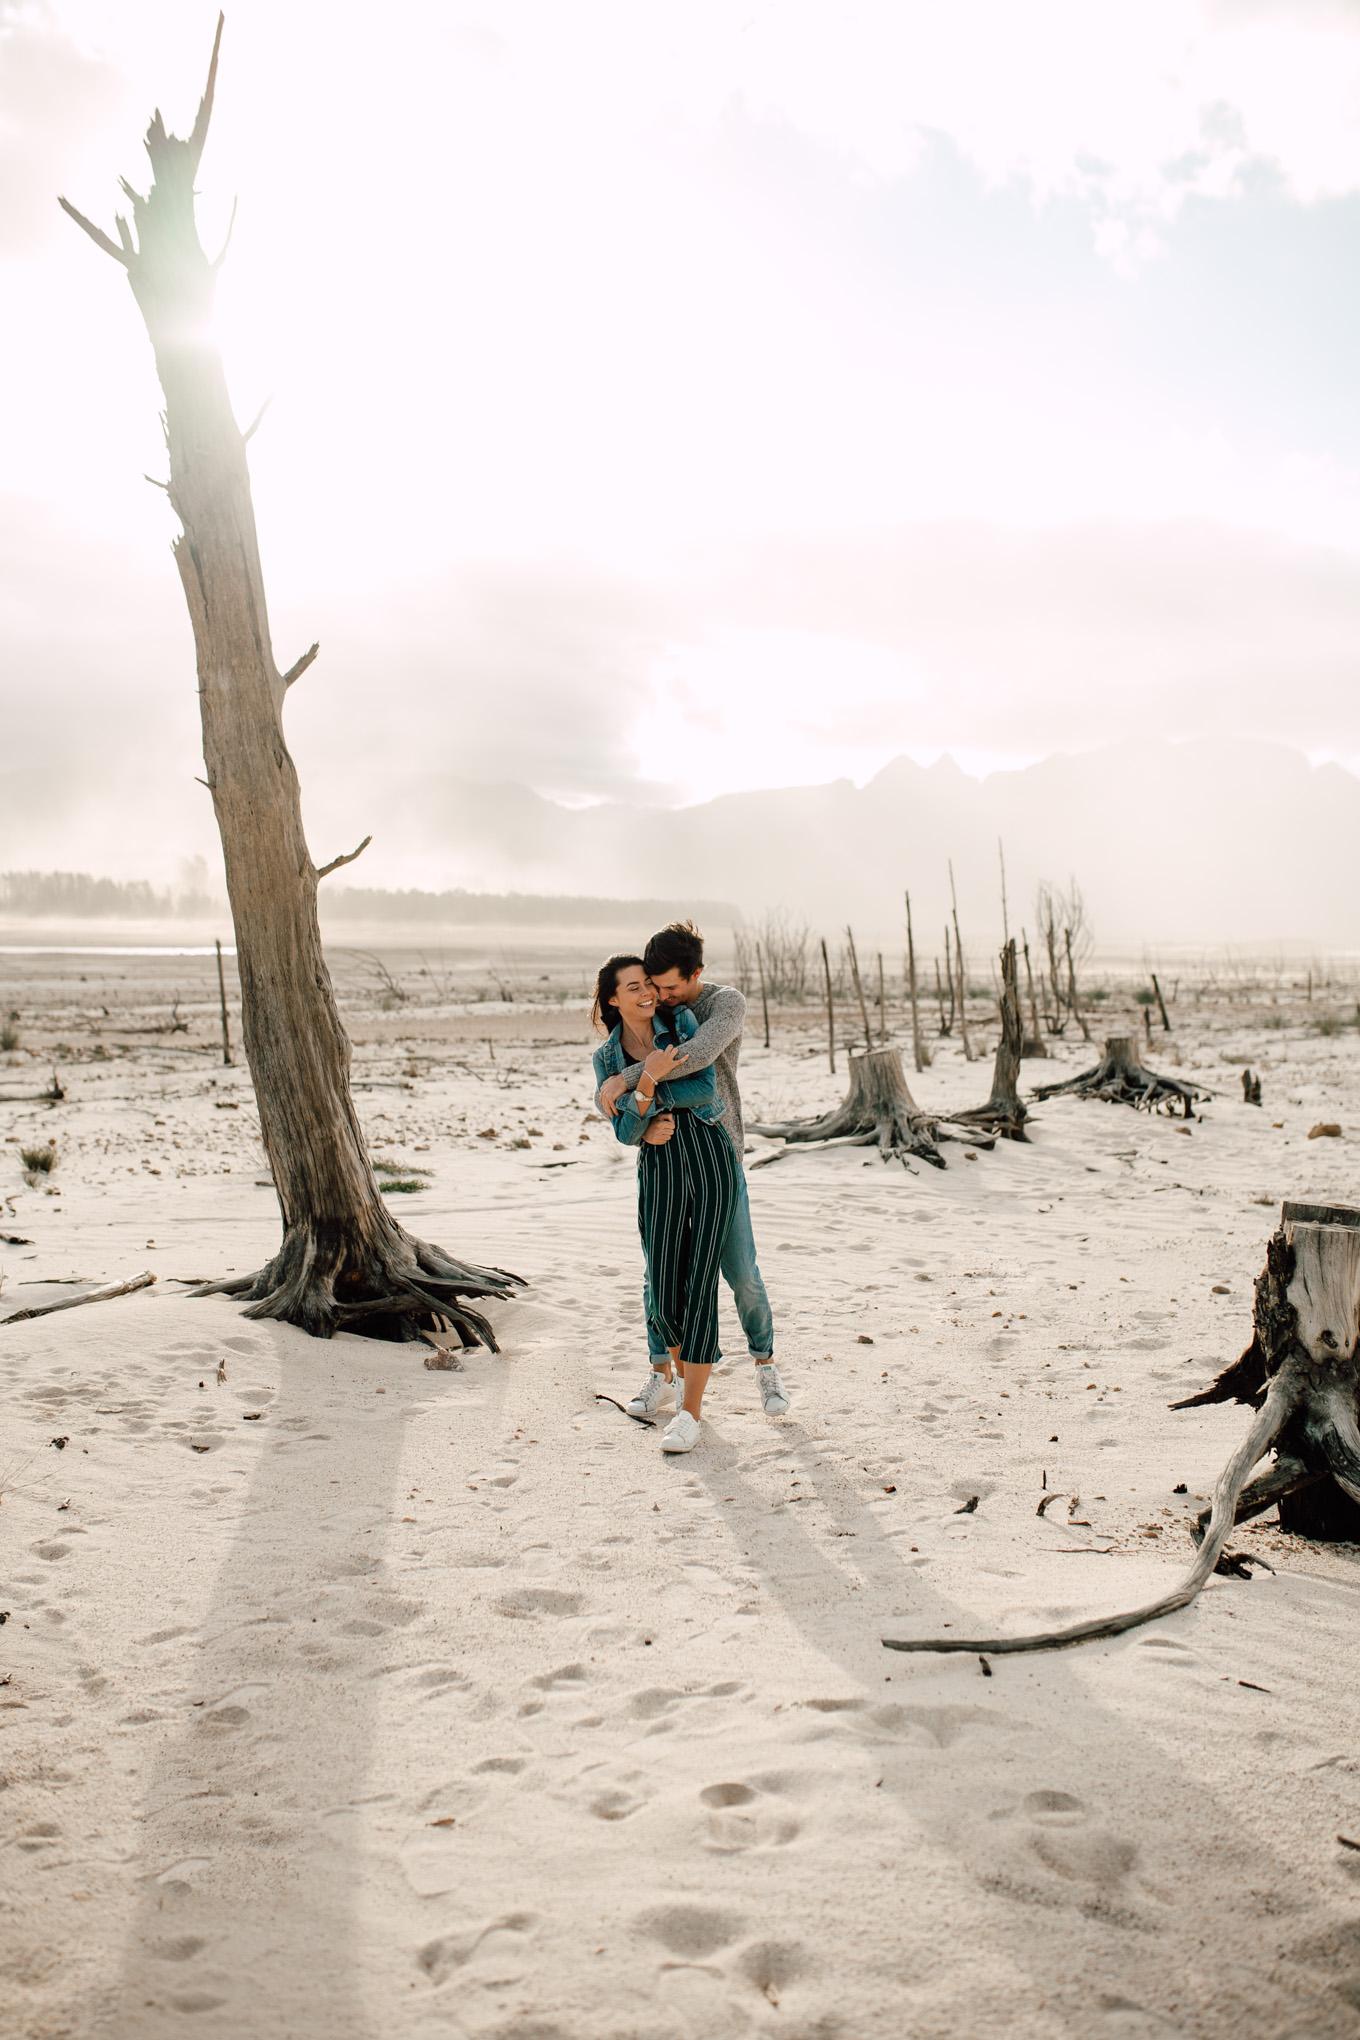 Cape-Town-Pia-Anna-Christian-Wedding-Photography-South-Africa-KF-35.jpg